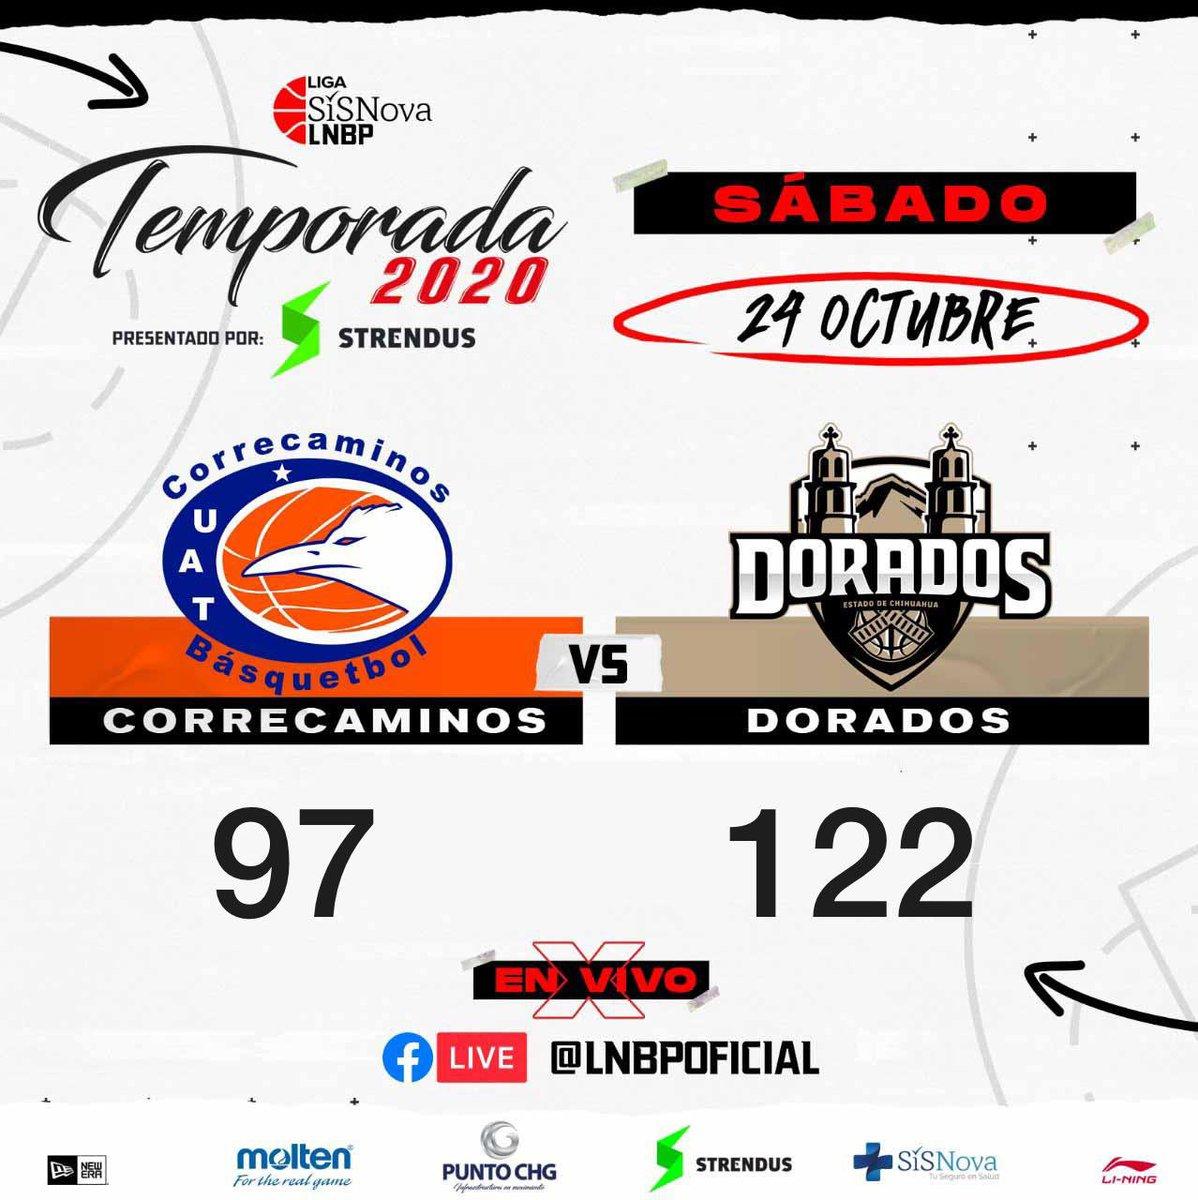 MARCADOR FINAL 🏀   @CorrebasketUAT  VS @DoradosChih   #Temporada2020 #LigaSisnovaLNBP #QuédateEnCasa #EsteEsMiJuego @LNBPoficial #LNBP @moltenmex  @liningmx  #sisnovamx  @neweramx  @strendusoficial  #puntochg https://t.co/zkIlIyunWf